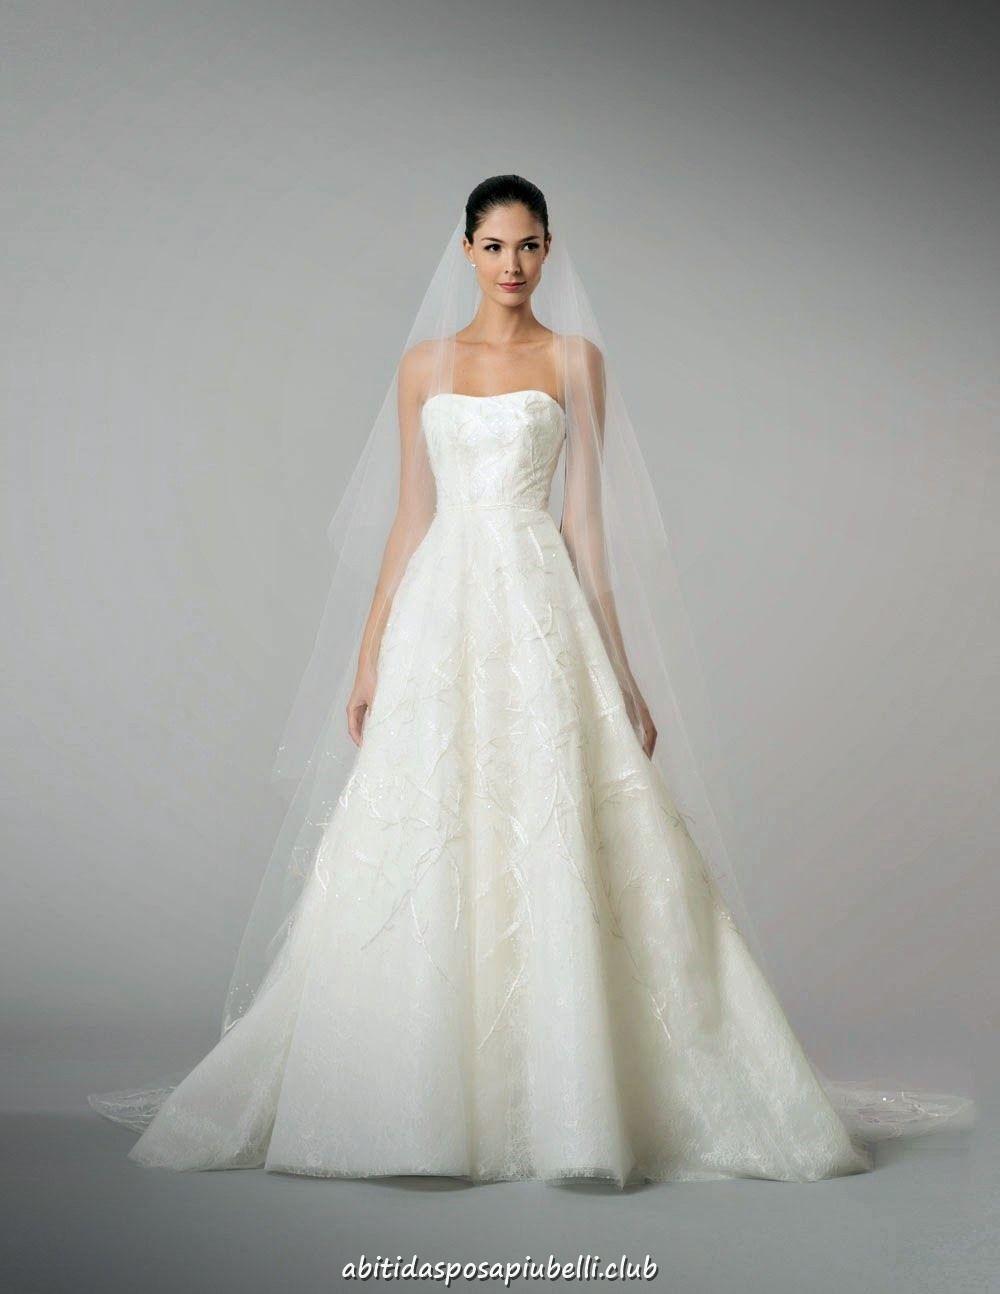 99114f93175bd Carolina Herrera Fall 2018 Abiti da sposa #abiti #carolina #herrera #sposa